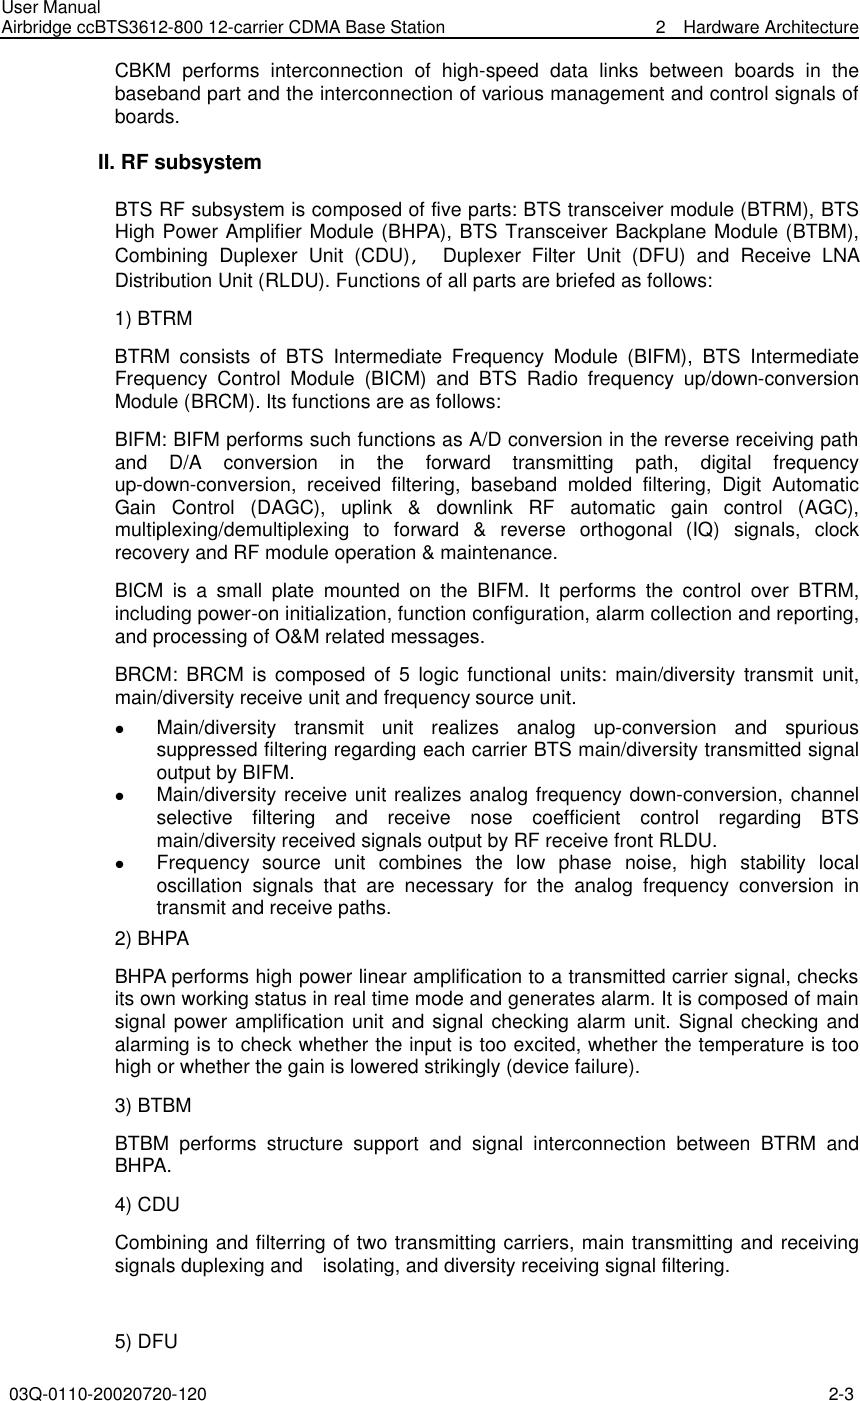 Huawei Technologies CBTS3612-800 CDMA Base Station User